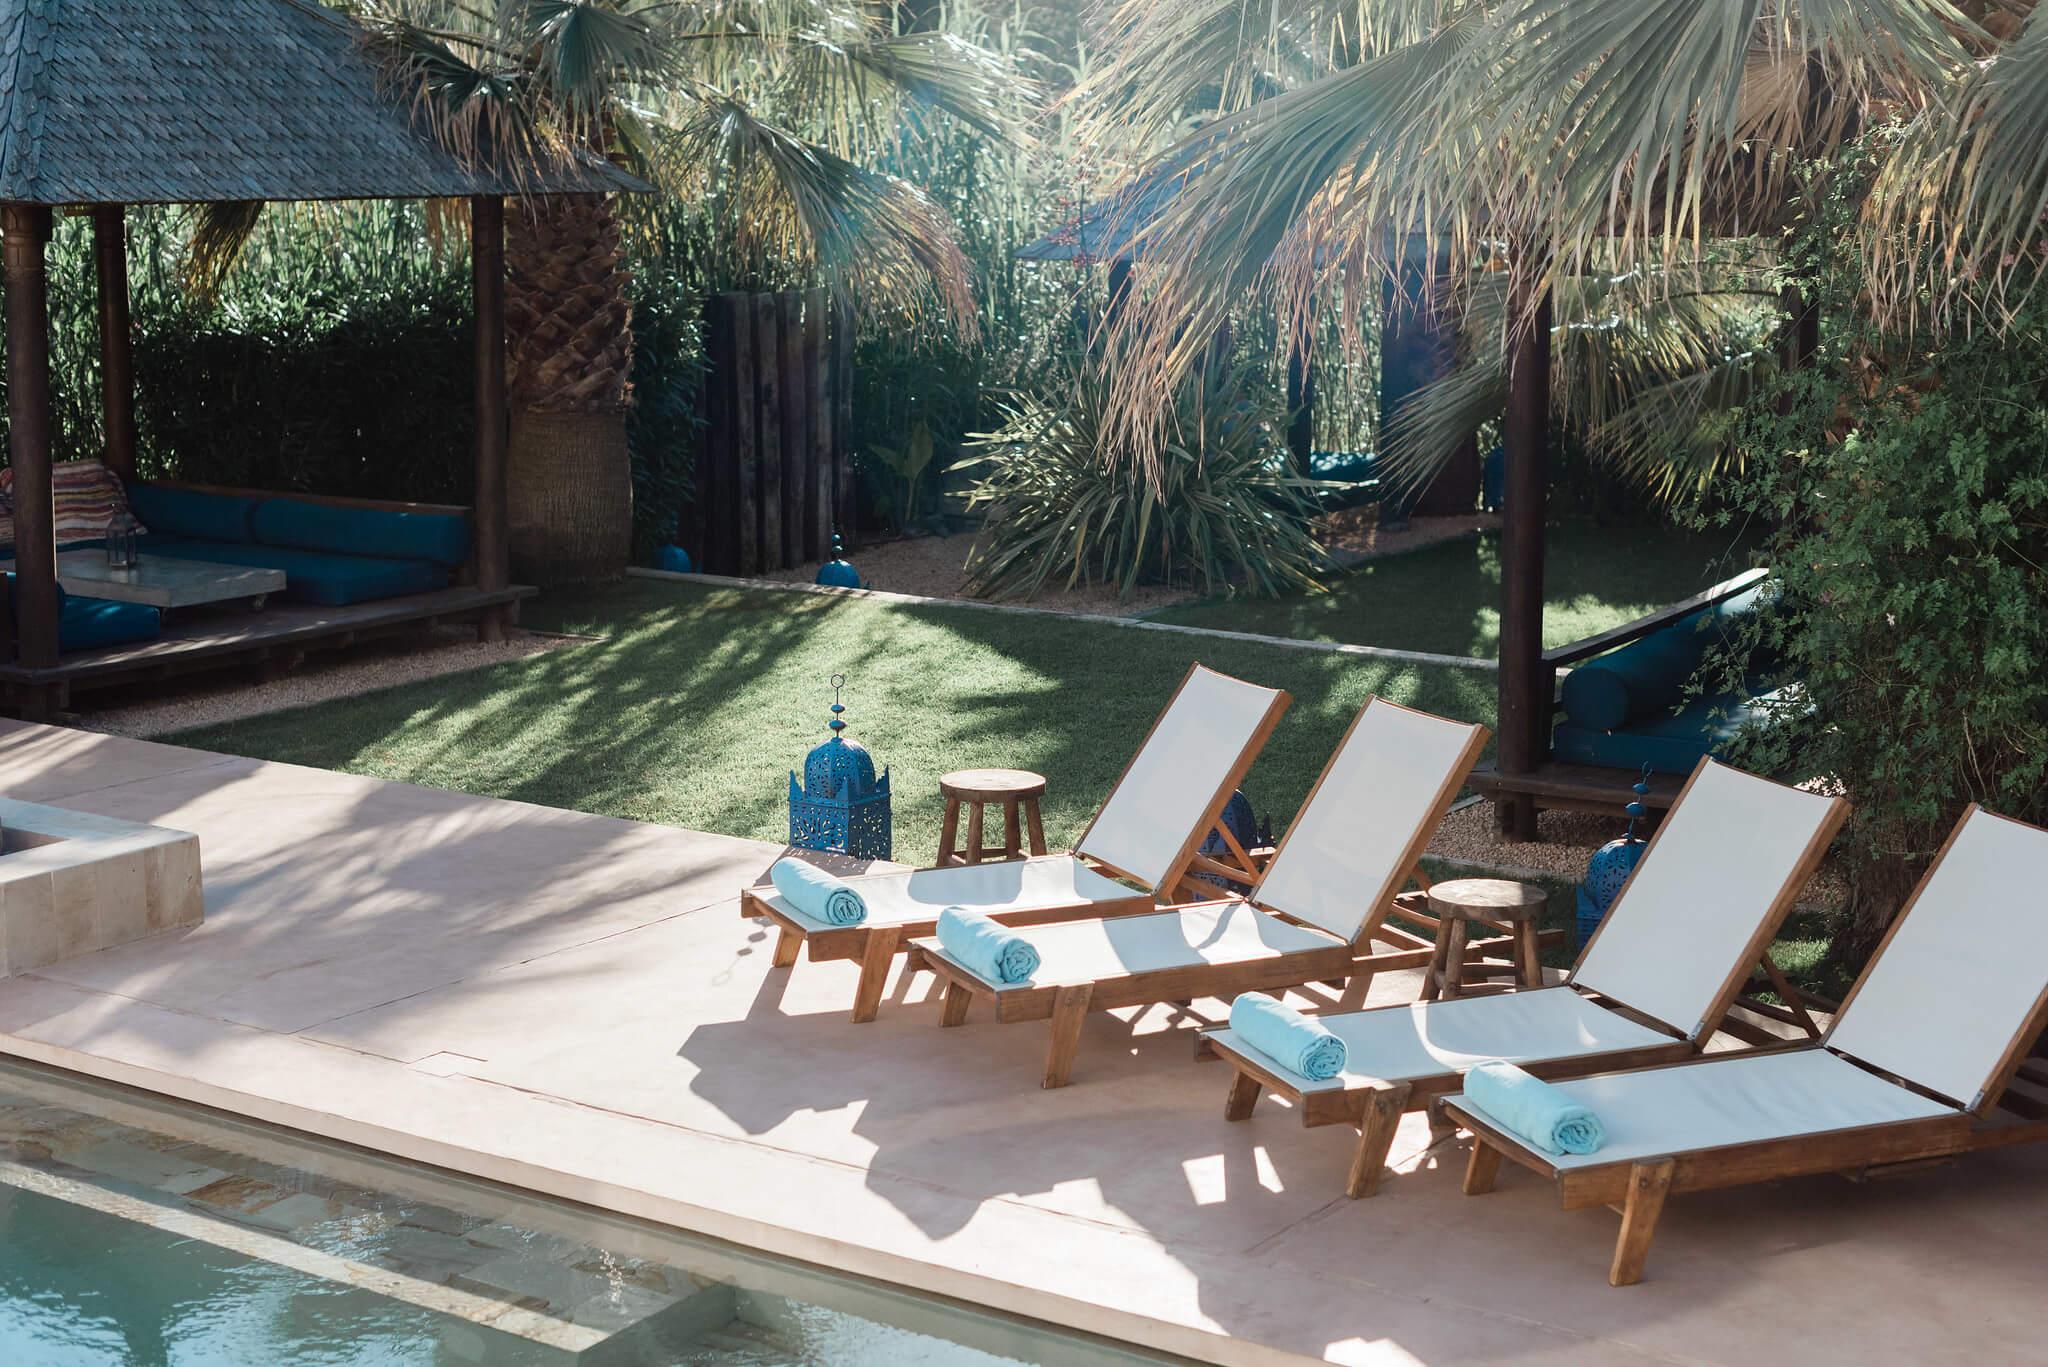 https://www.white-ibiza.com/wp-content/uploads/2020/03/white-ibiza-boutique-hotels-the-giri-residence-2020-03.jpg